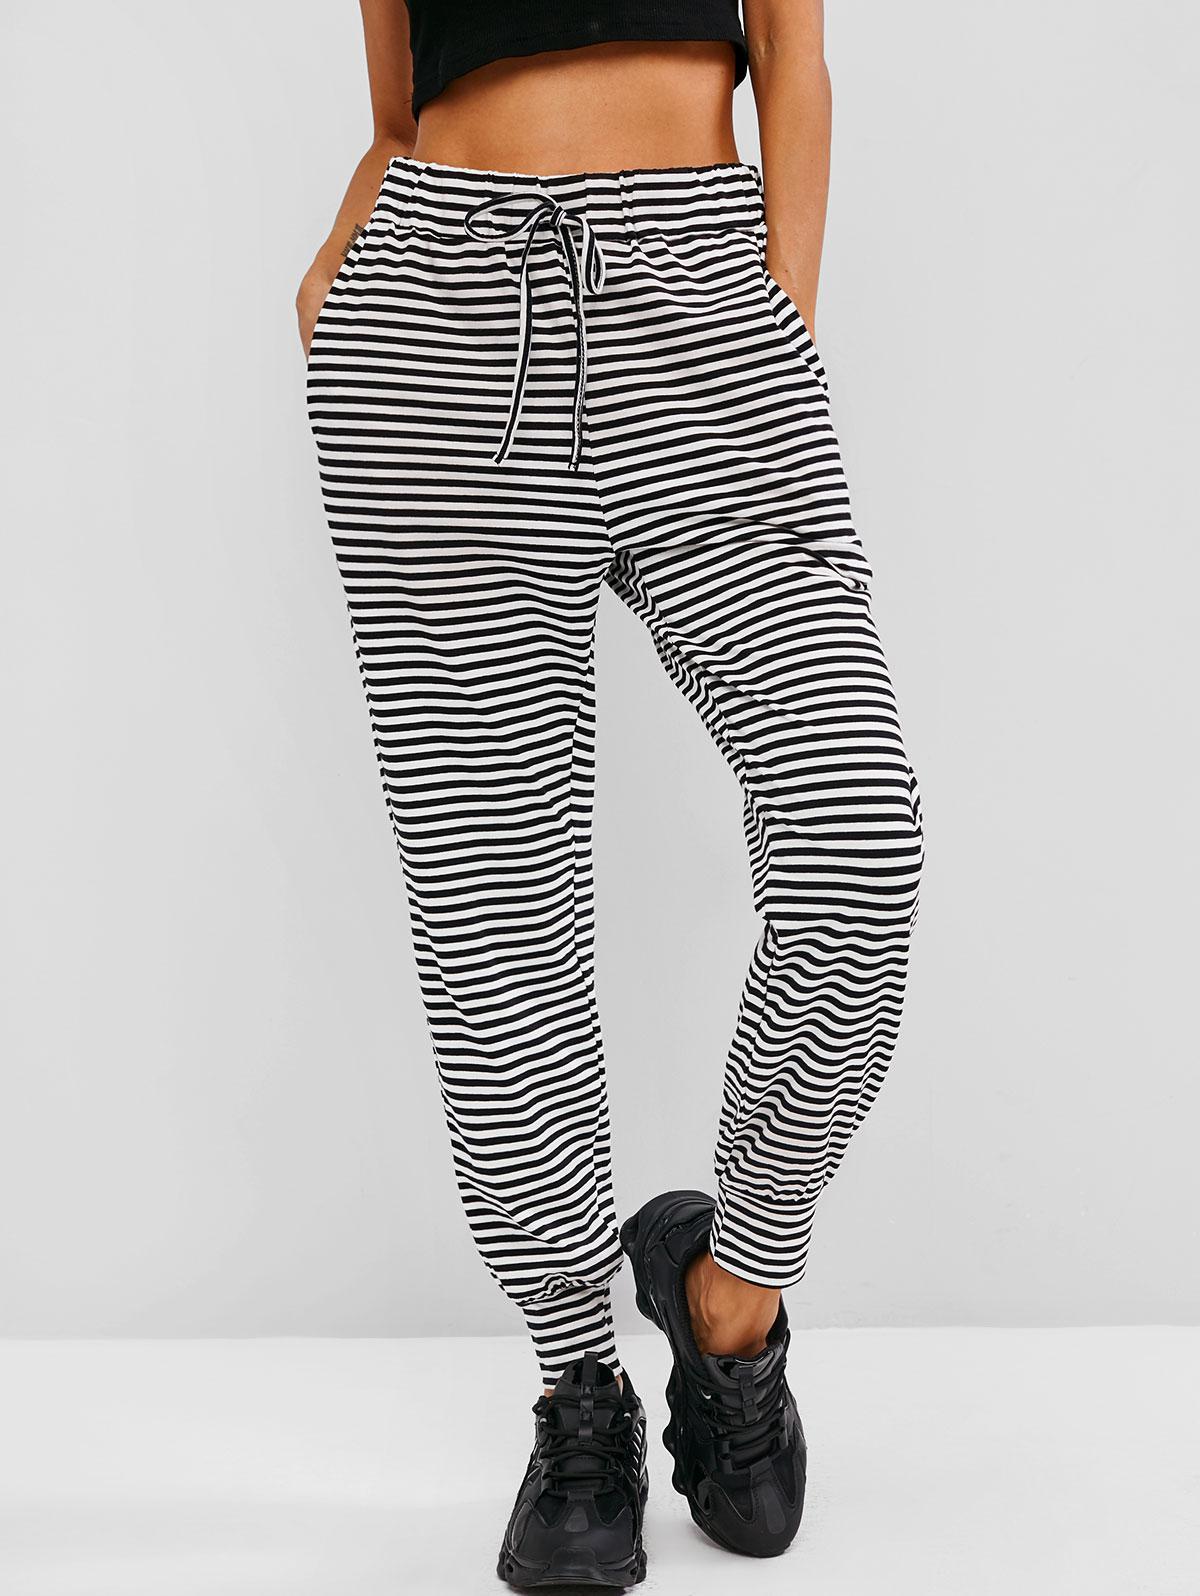 Drawstring Stripes Seam Pockets Sweatpants